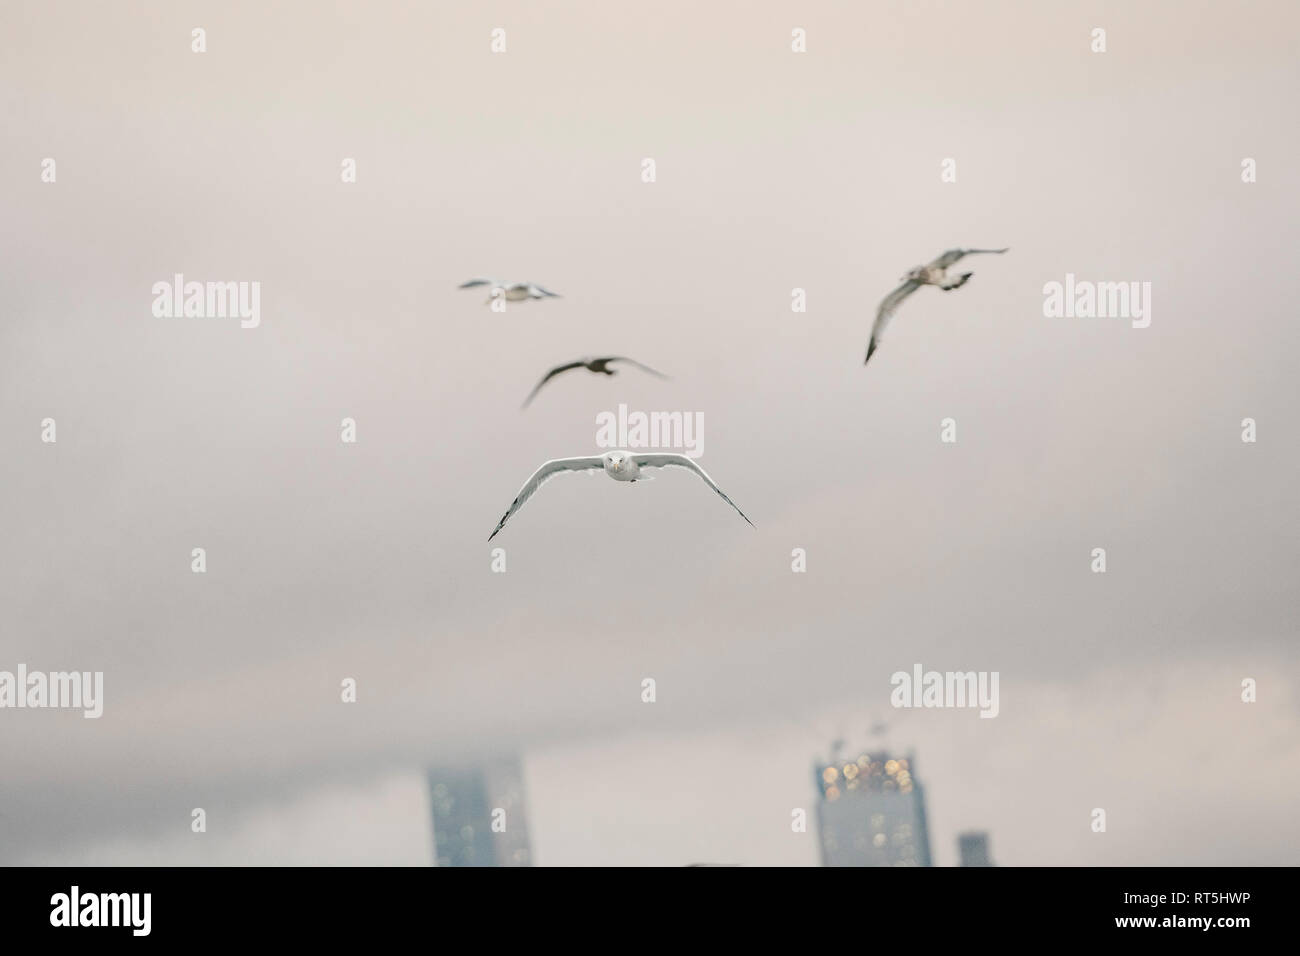 USA, New York, Manhattan, birds fly - Stock Image